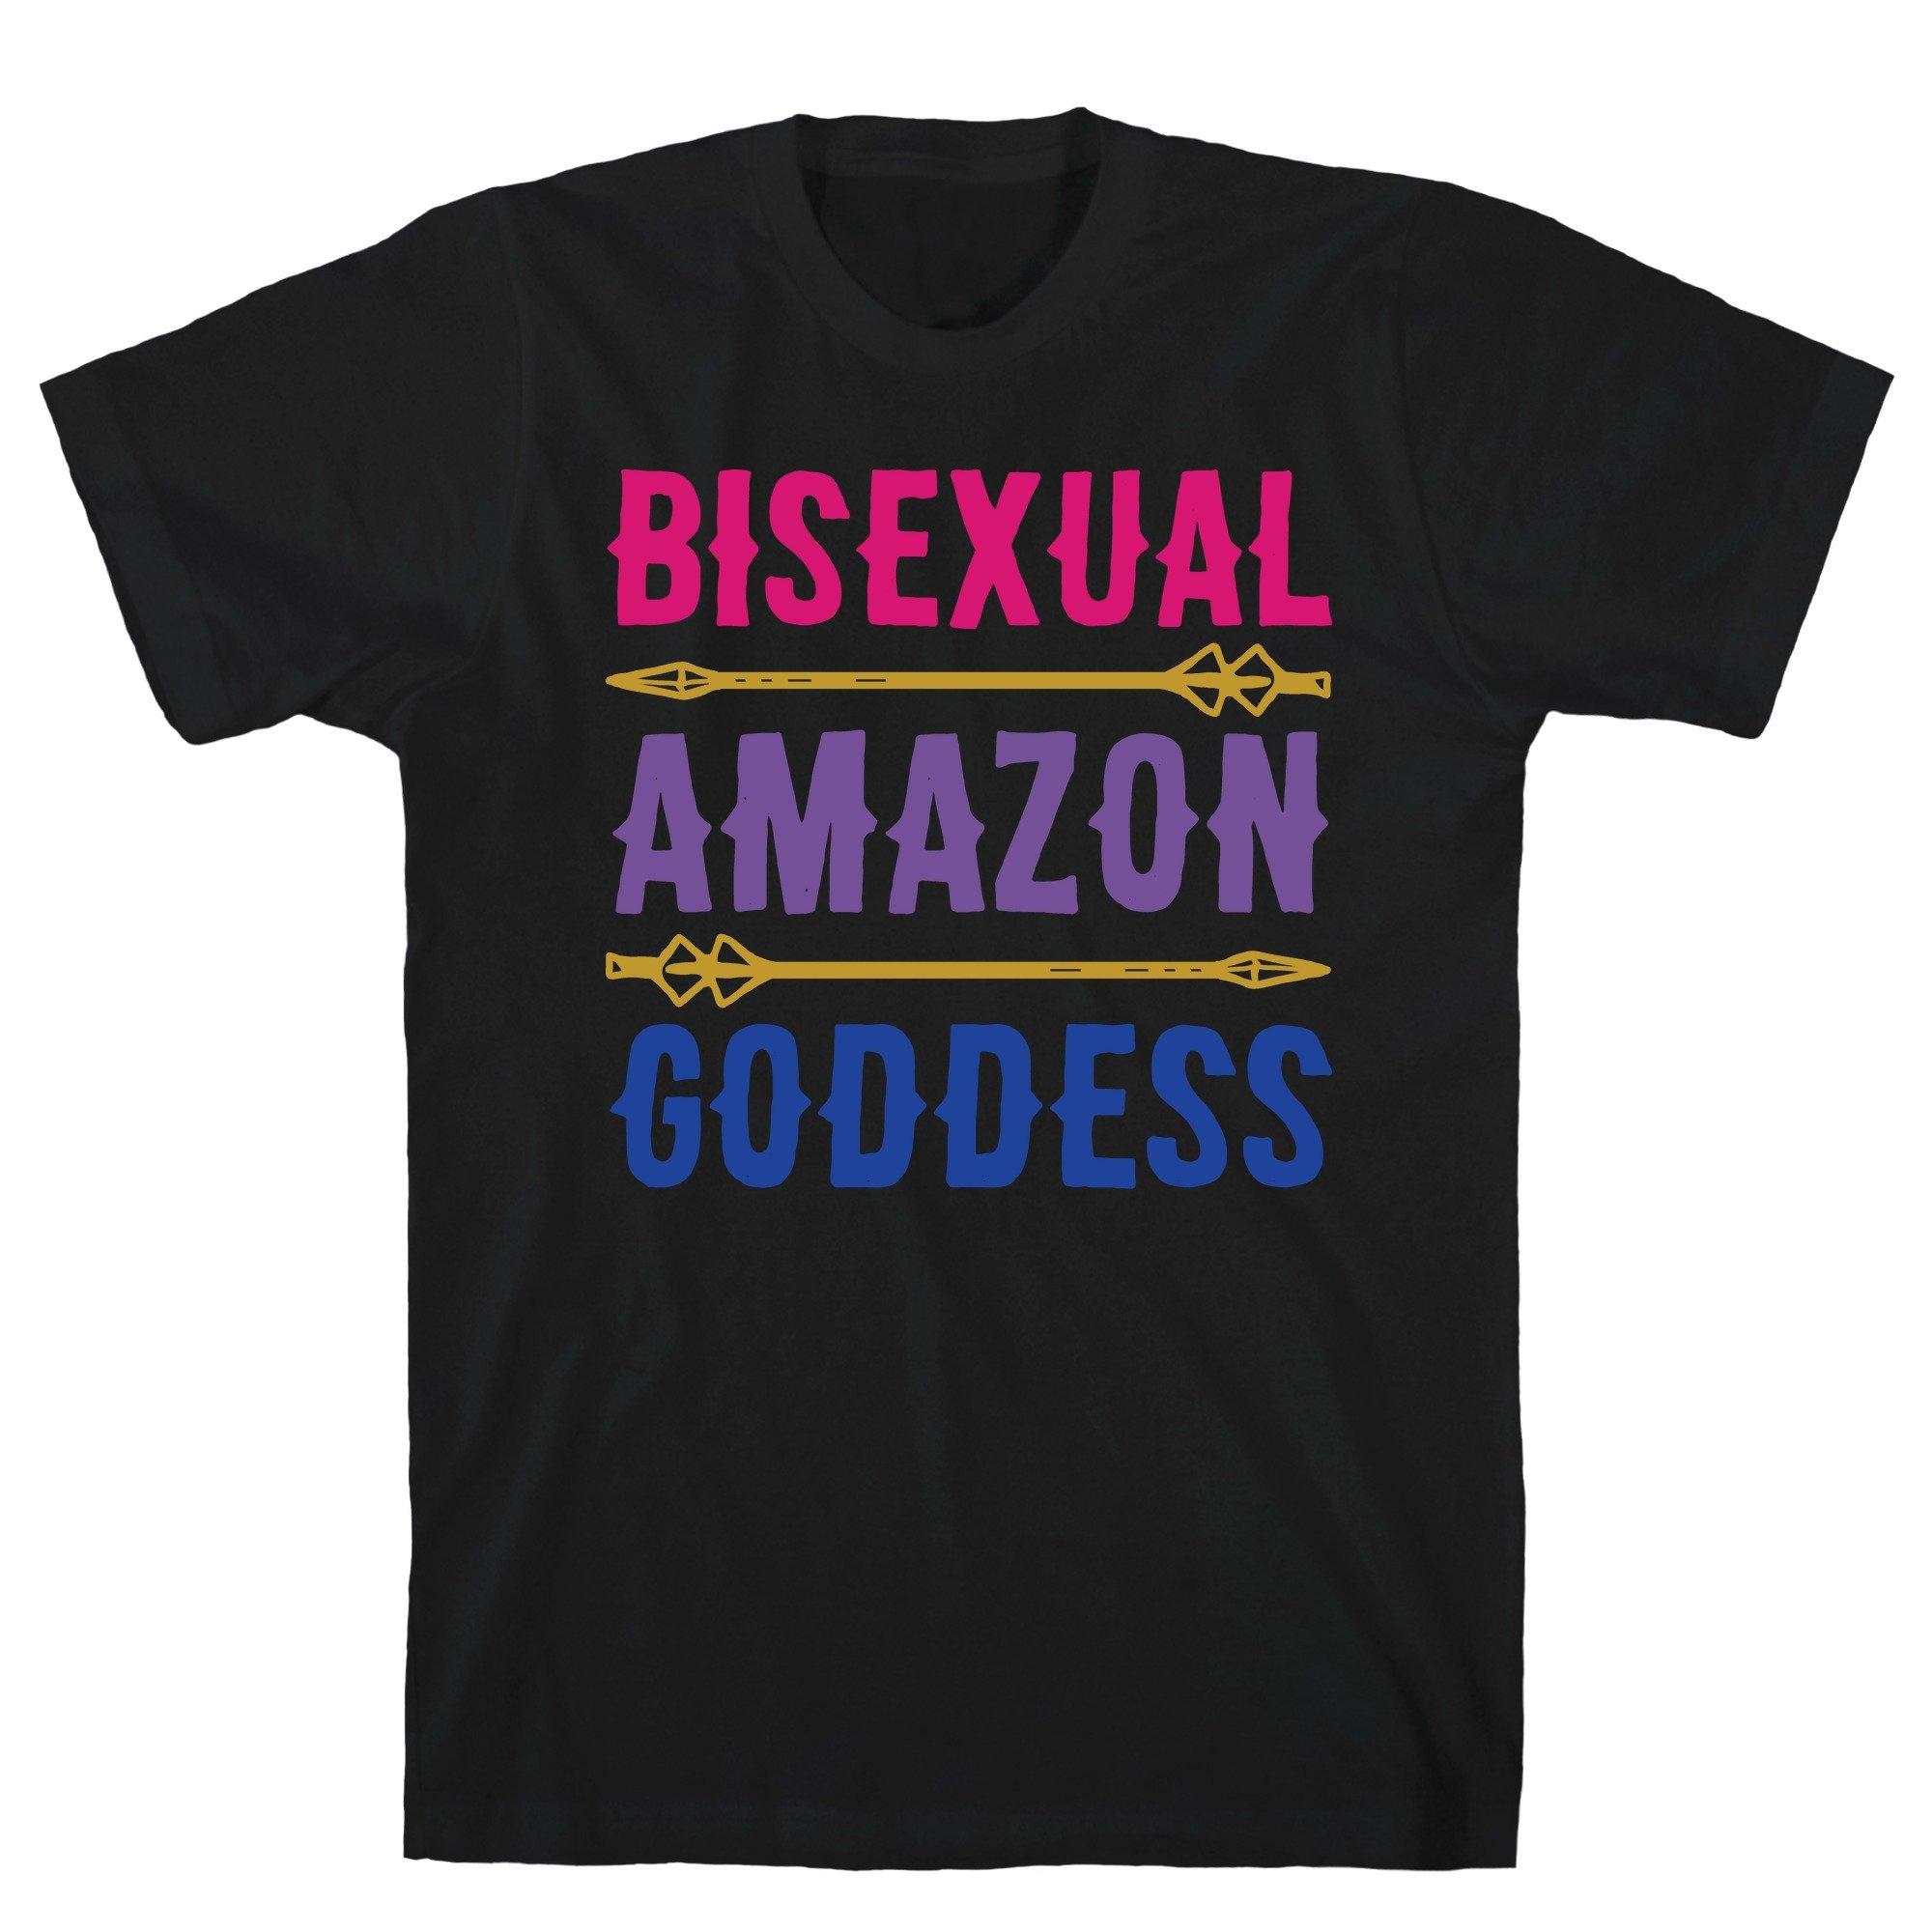 Bisexual Amazon Goddess Parody Print Black S Ts Shirts